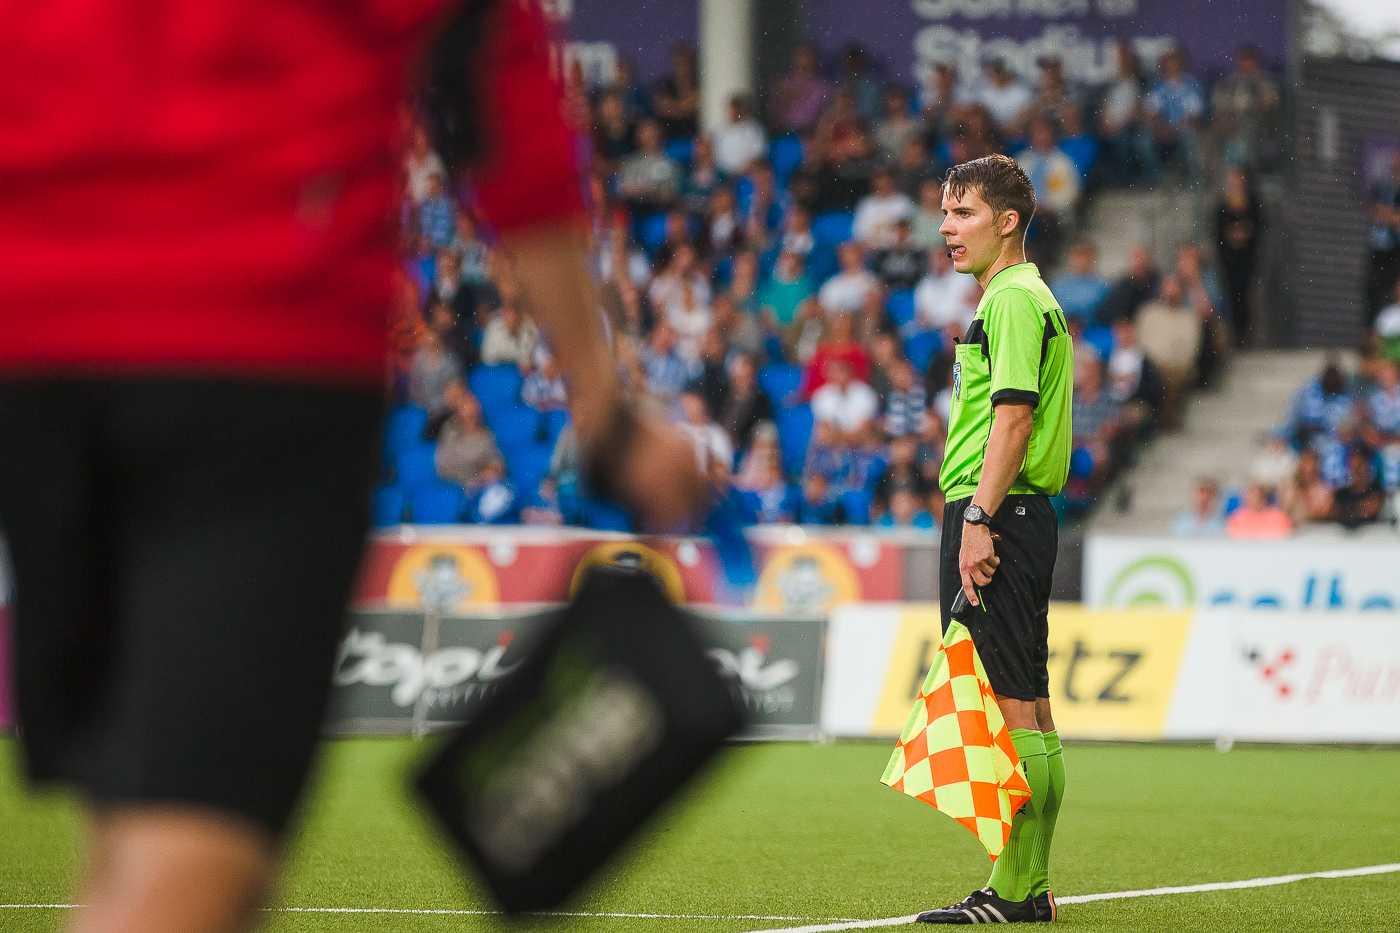 Assistant referee Mika Lamppu. Photo by: Olli Jantunen.